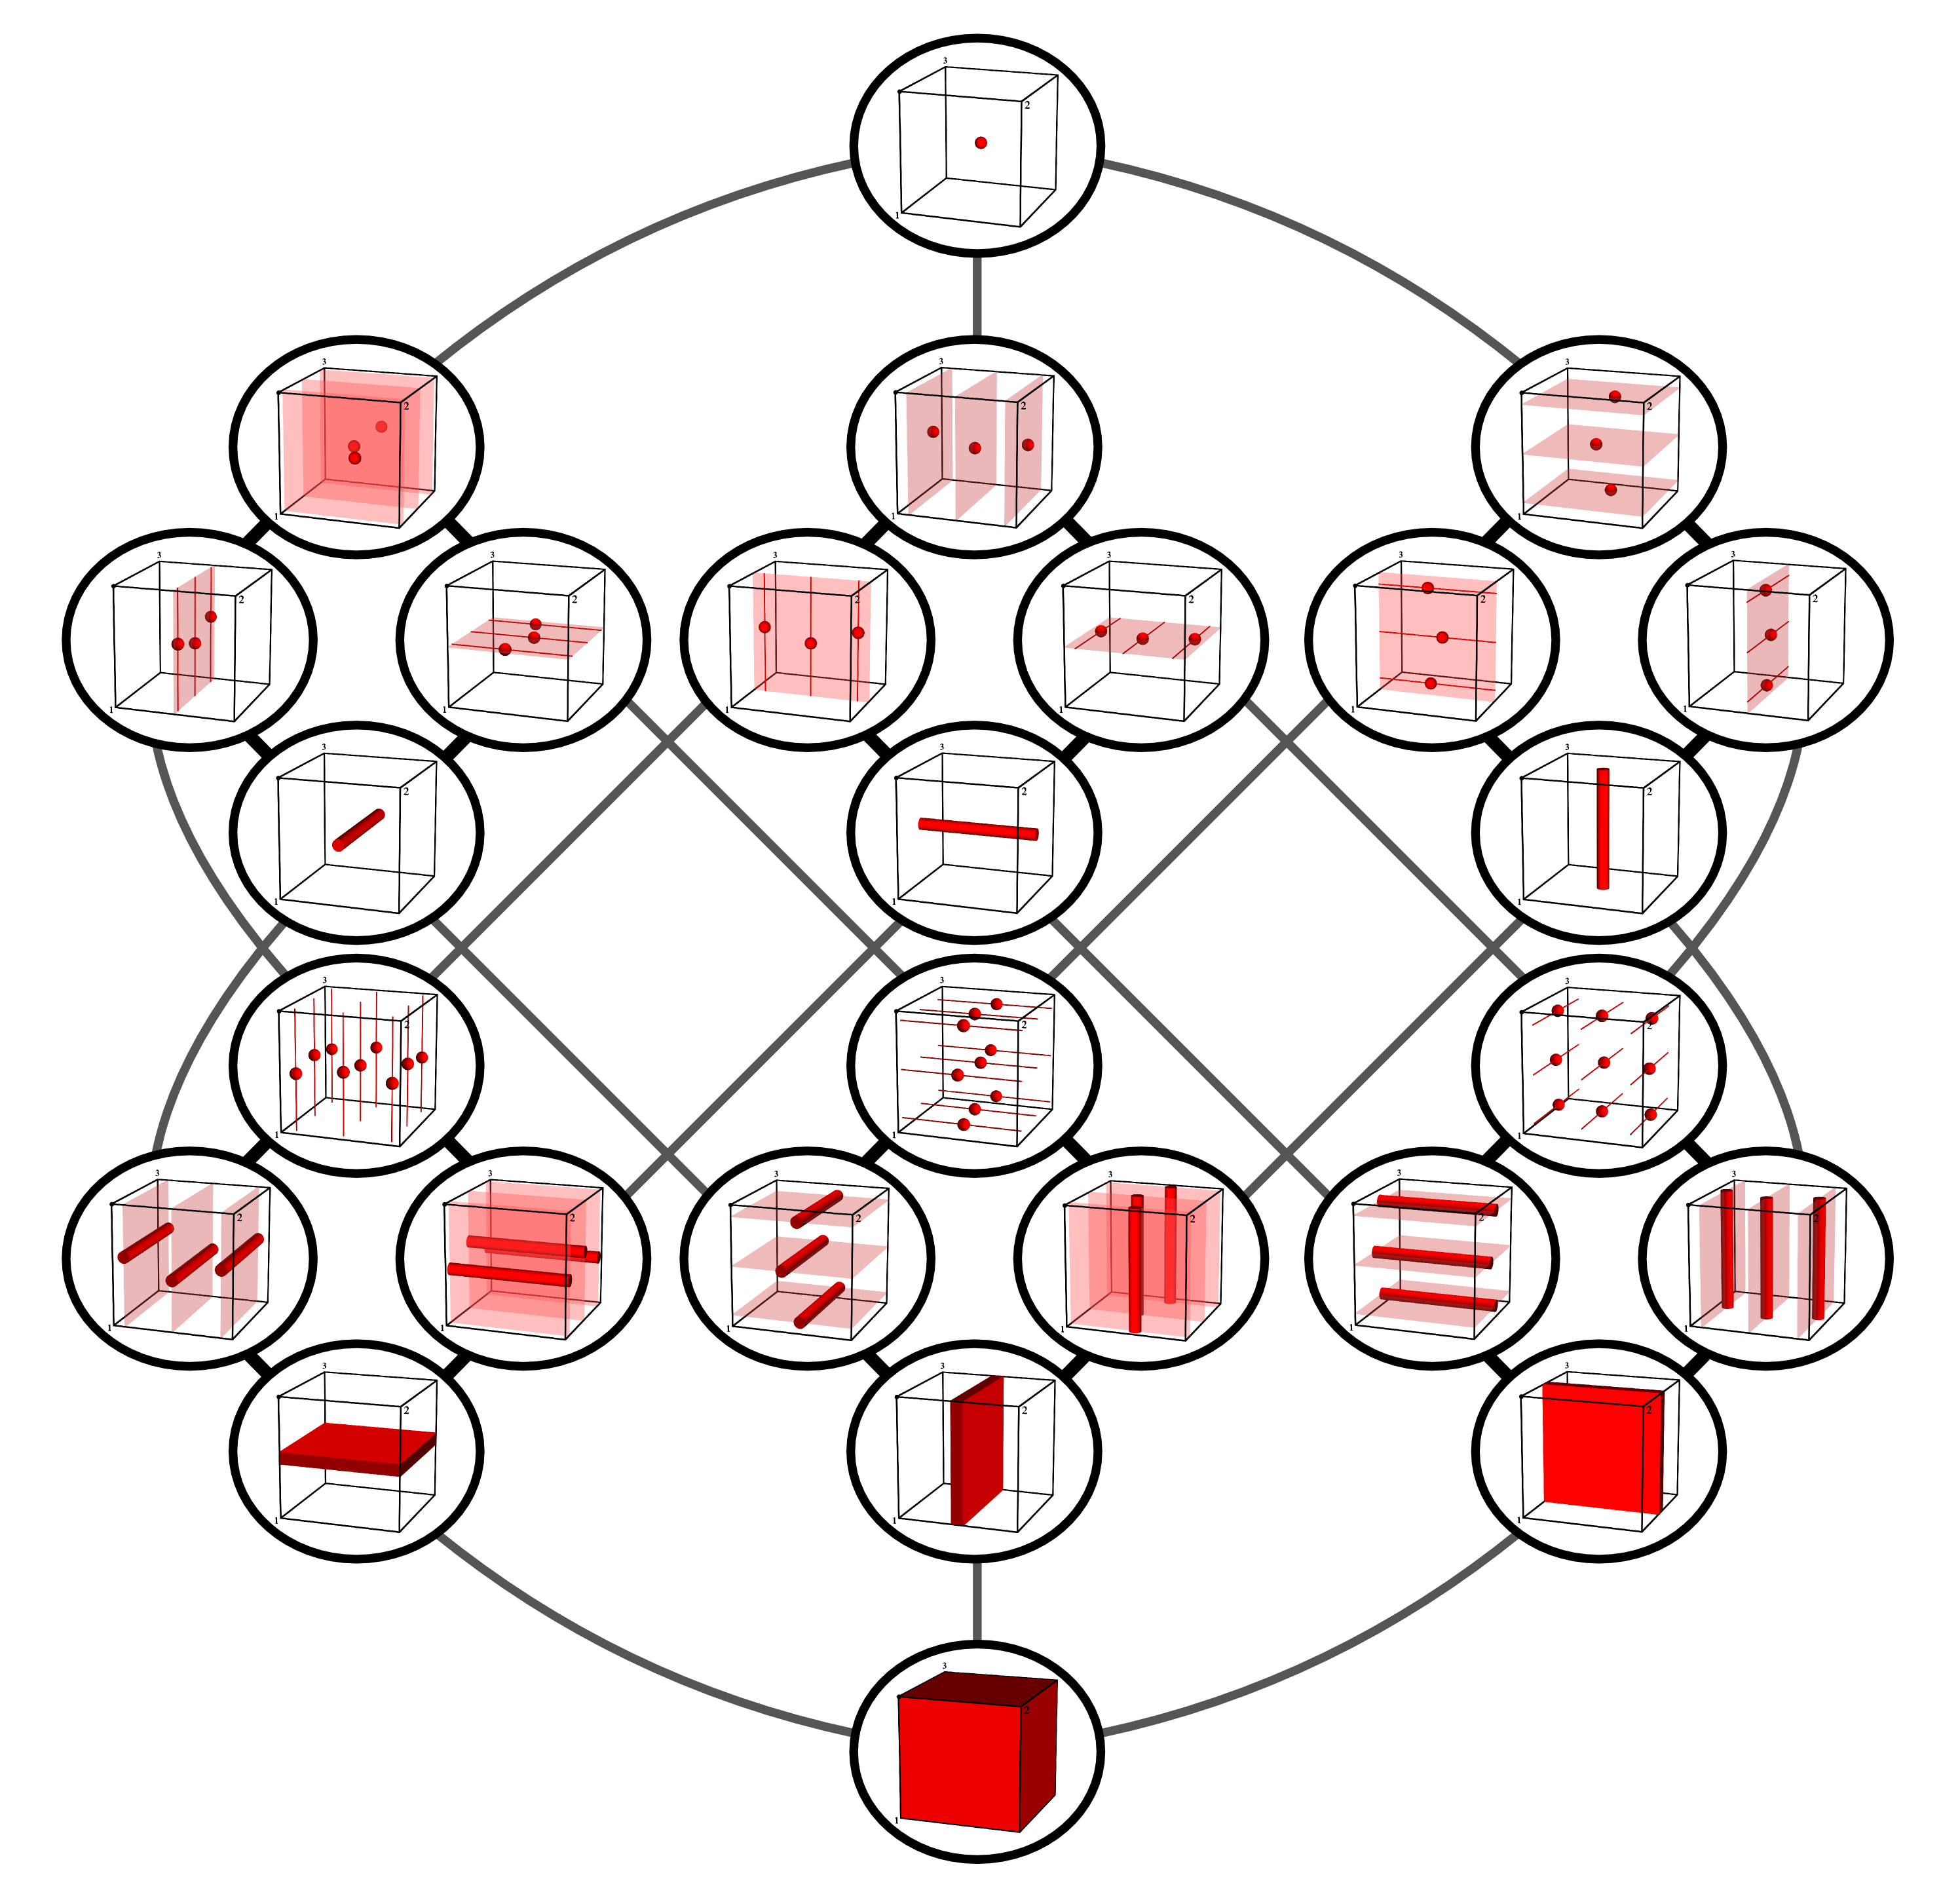 Cube clipart logical. File concertina graph tensor